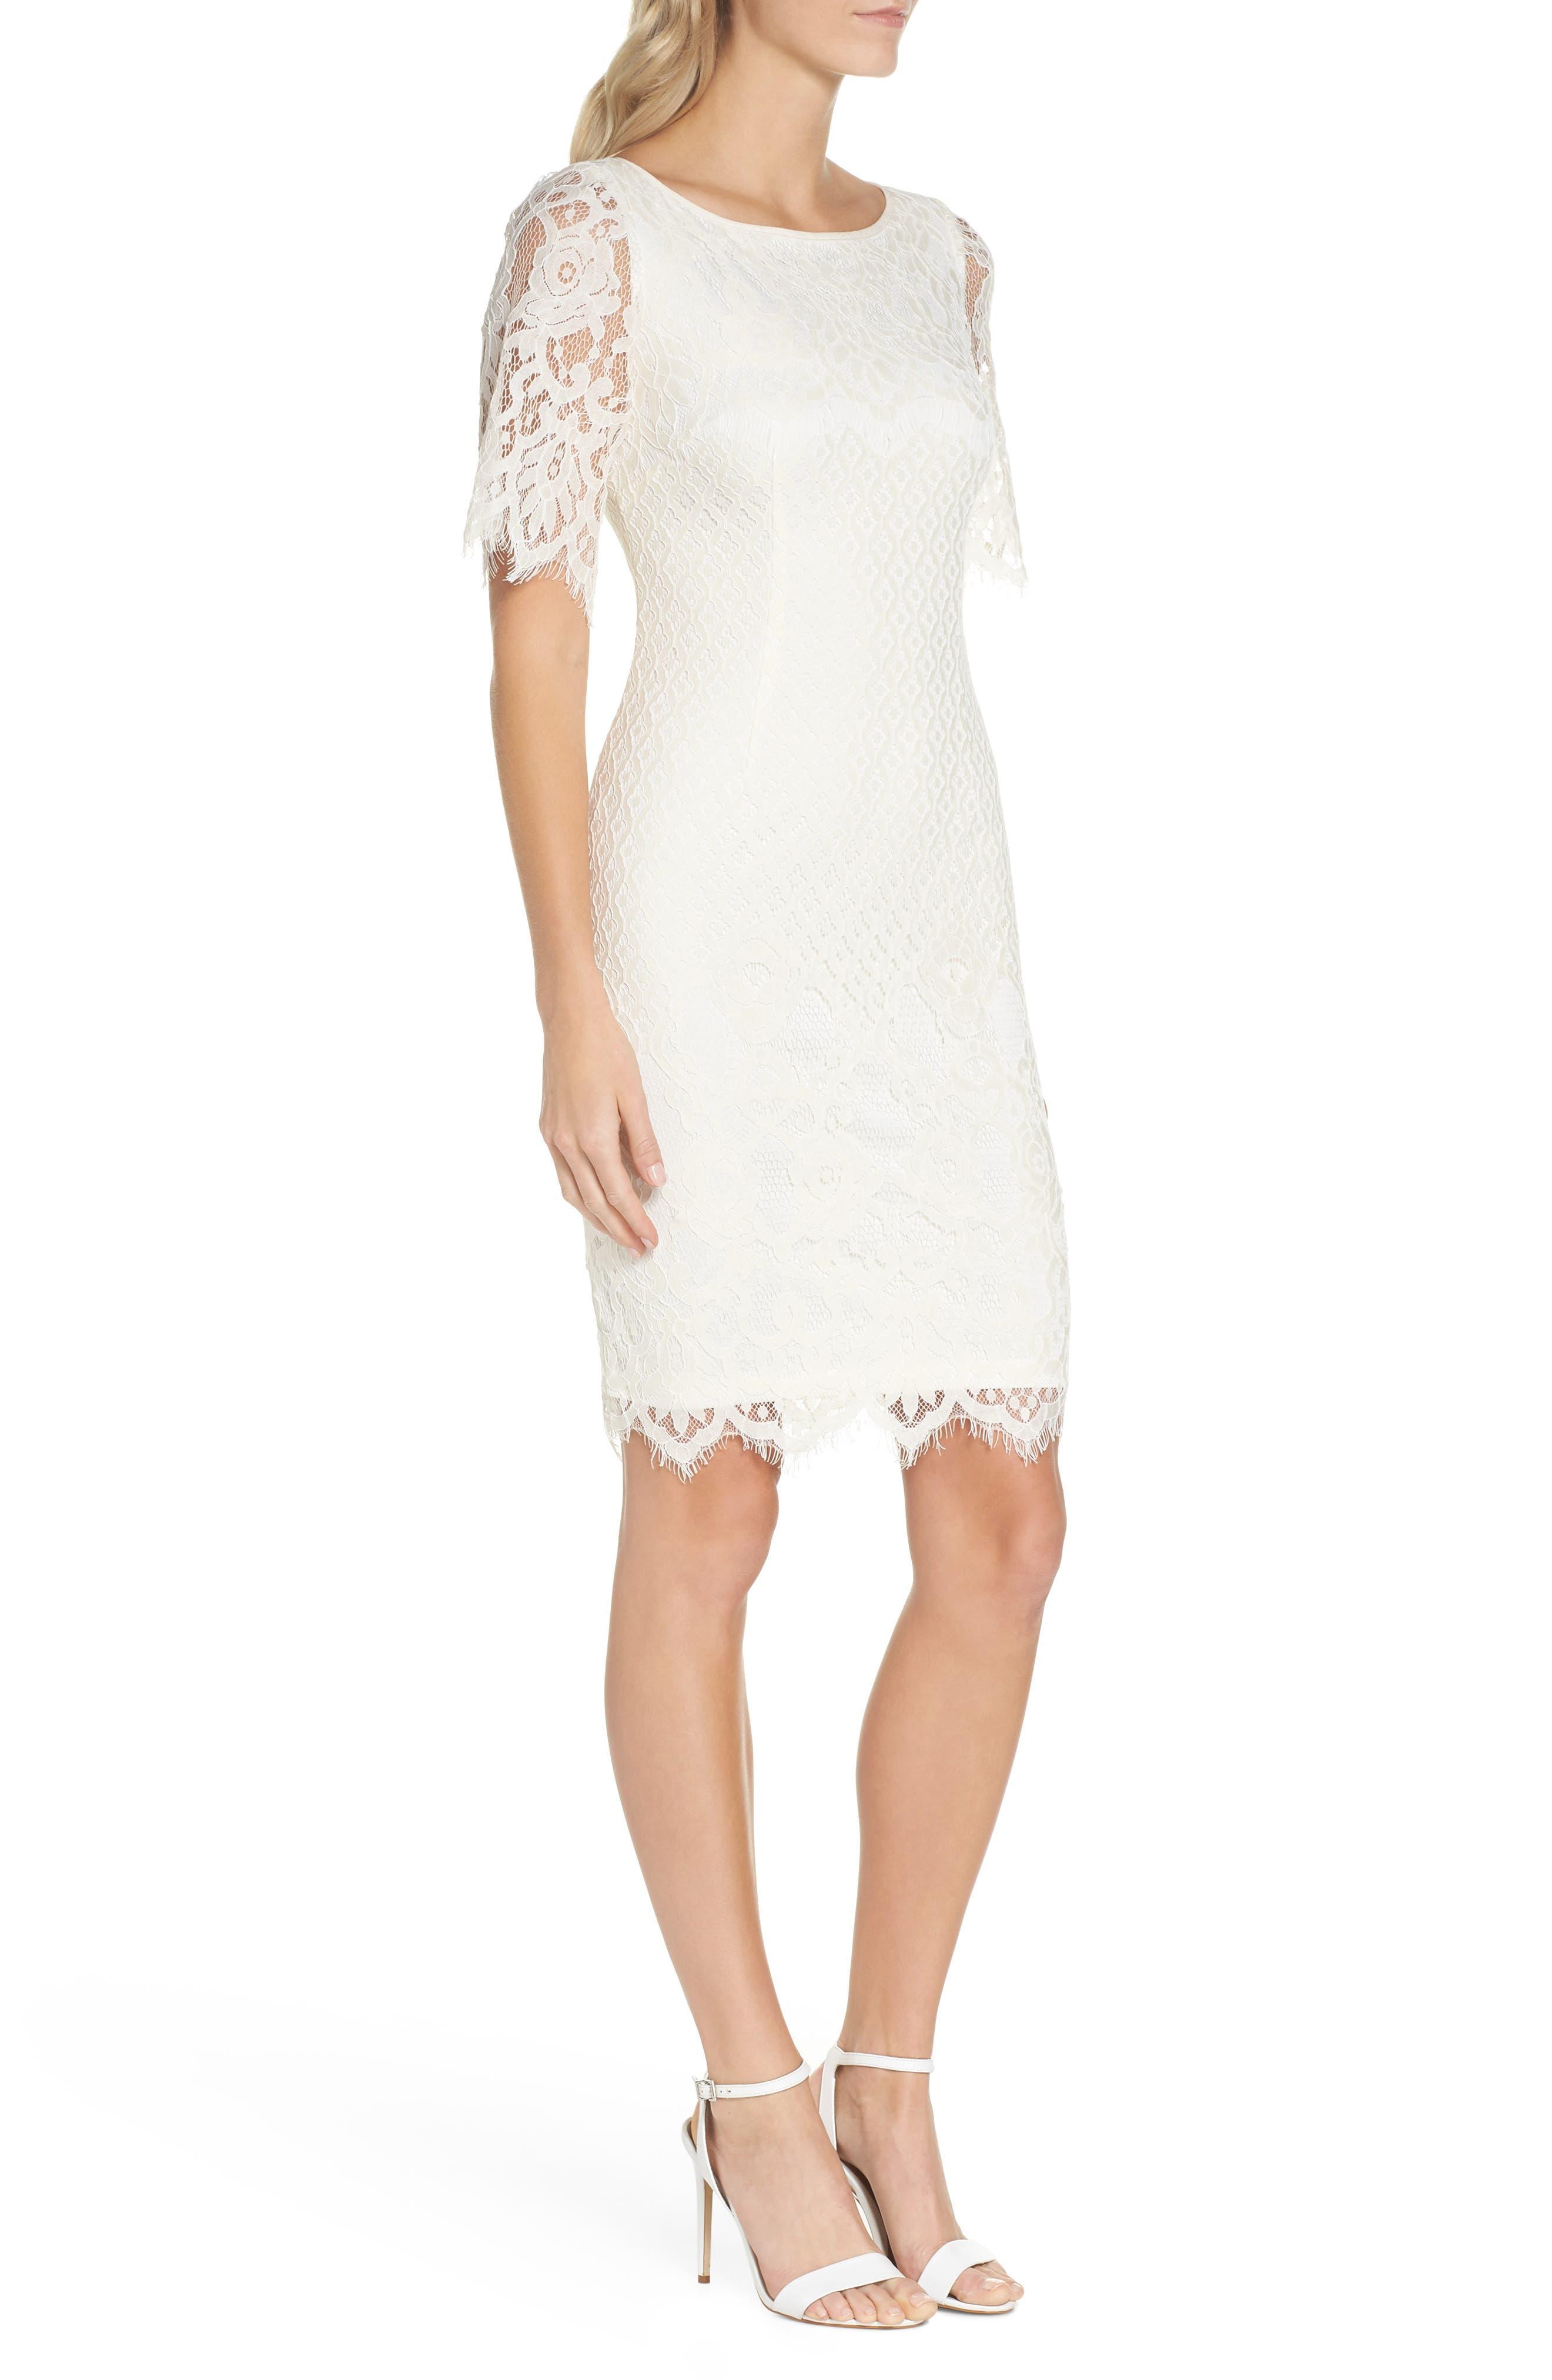 Georgia Scalloped Lace Sheath Dress,                             Alternate thumbnail 3, color,                             Ivory